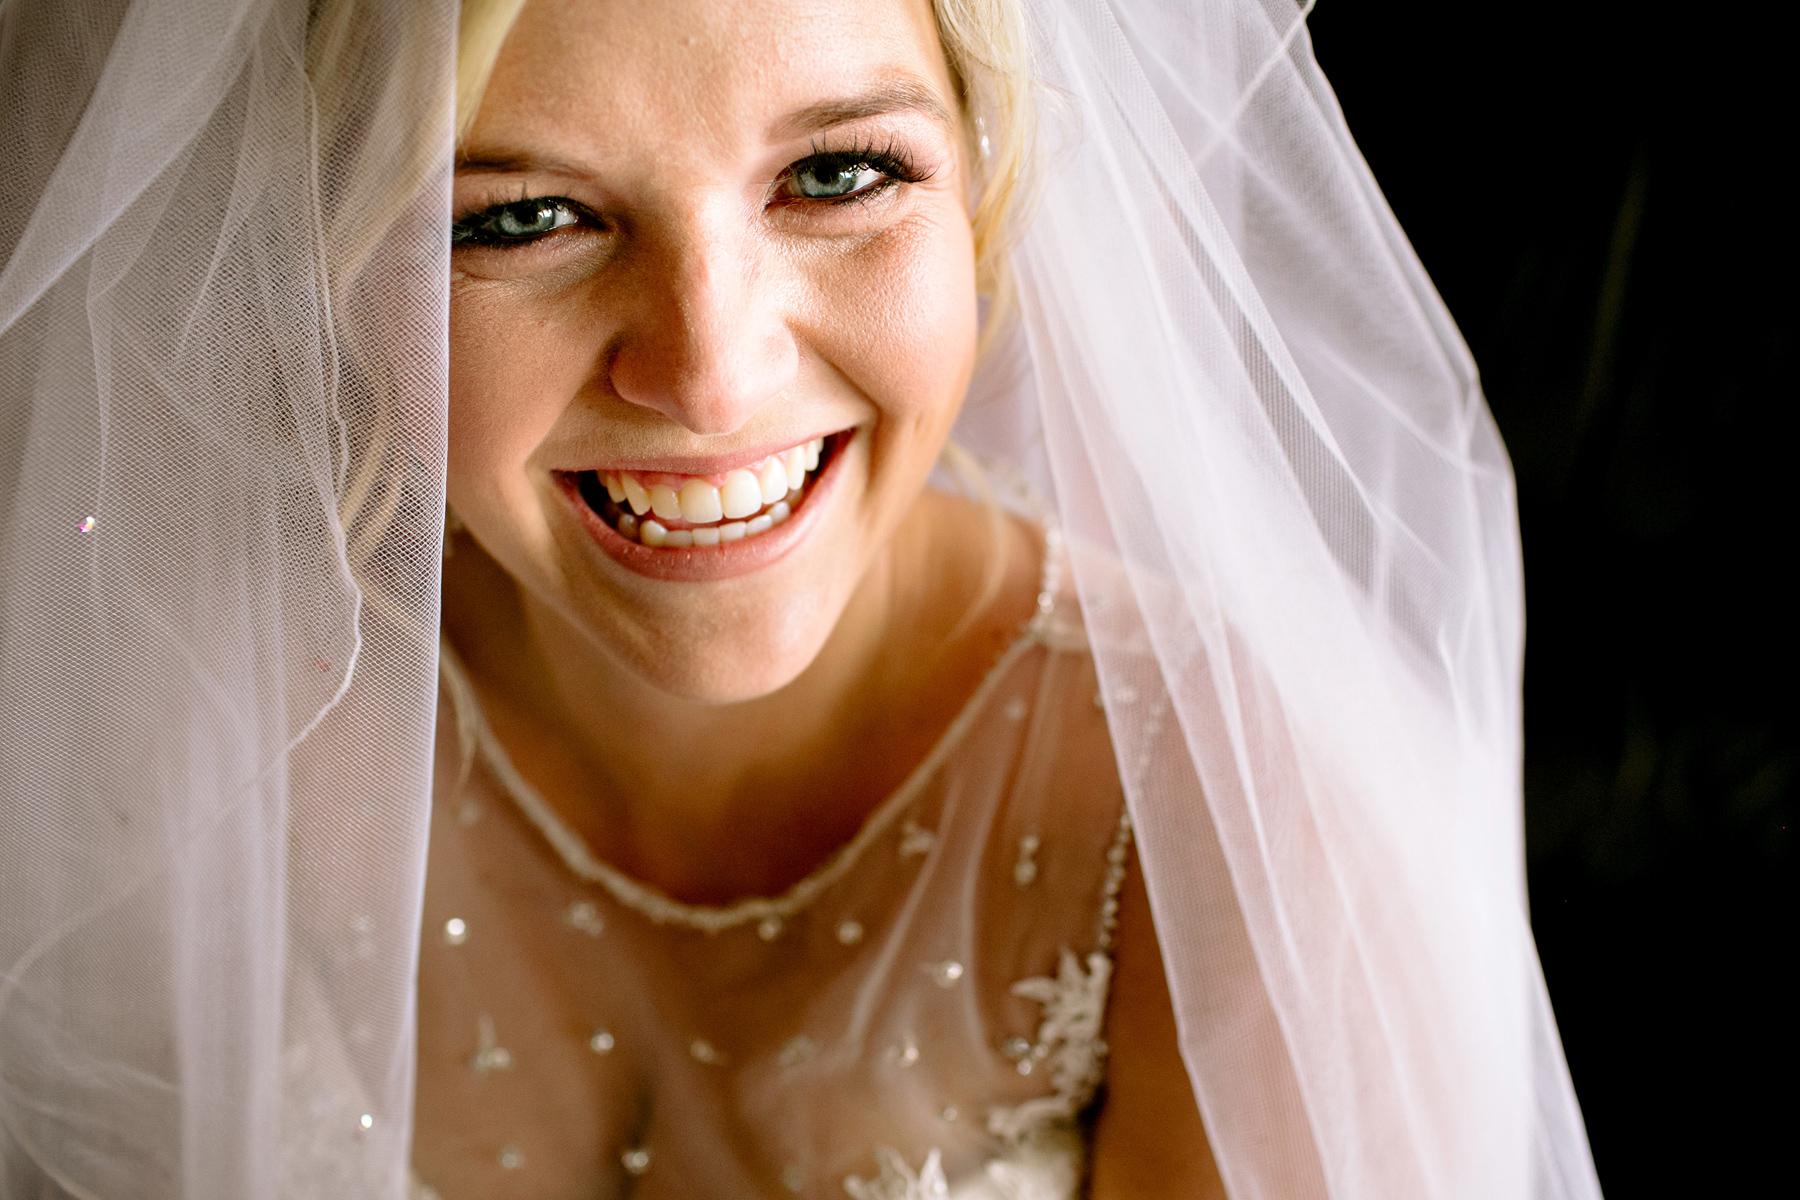 007-awesome-pei-wedding-photography-kandisebrown-jg2016